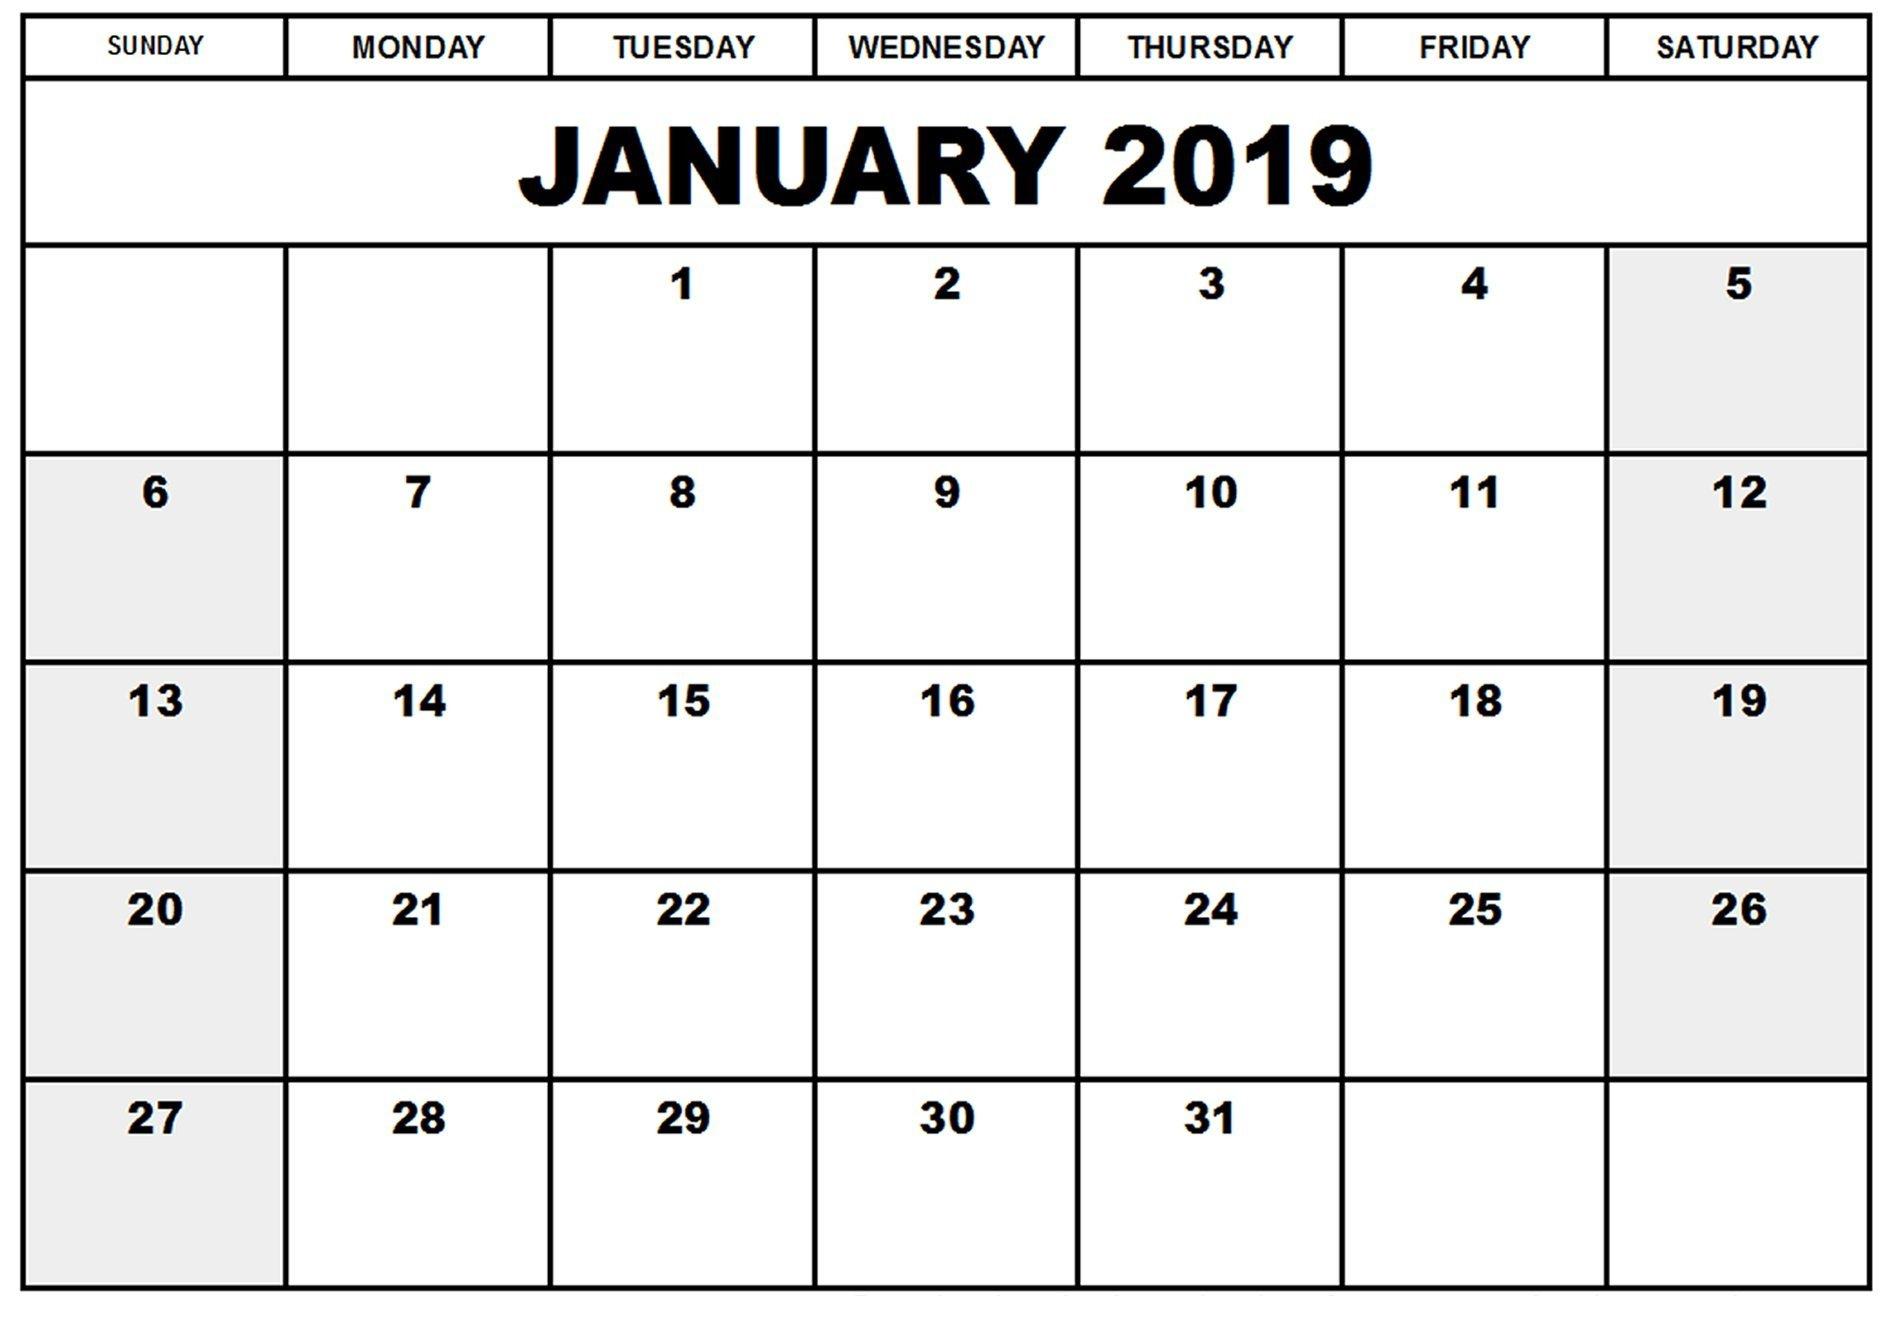 Printable Calendar I Can Edit :-Free Calendar Template Calendar I Can Edit